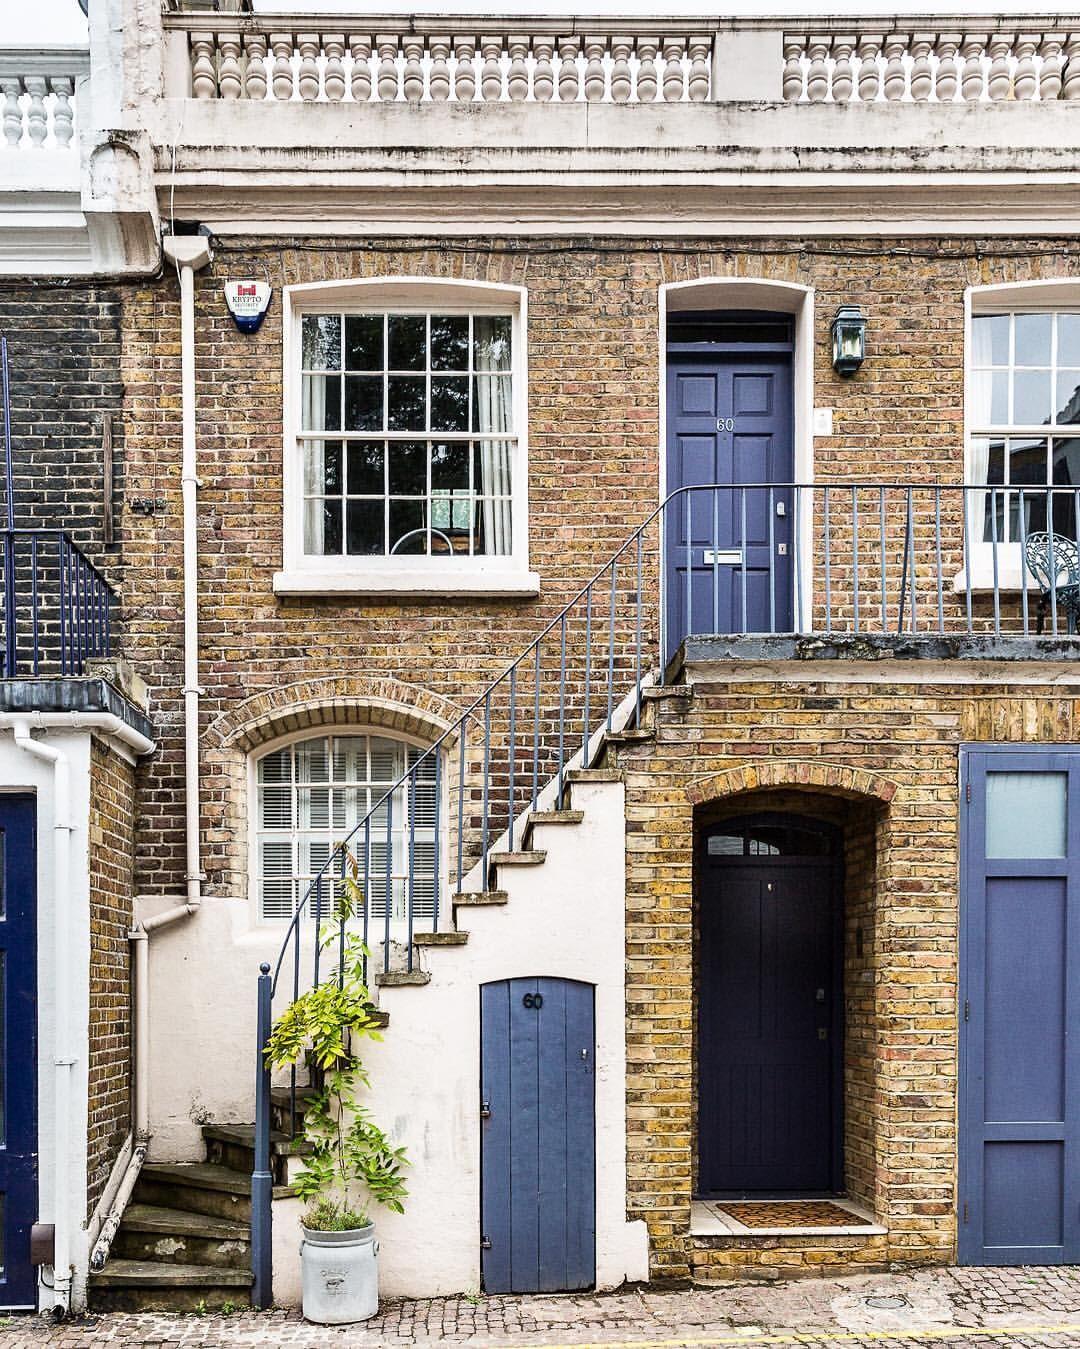 London Apartments Exterior: London House Exterior, London